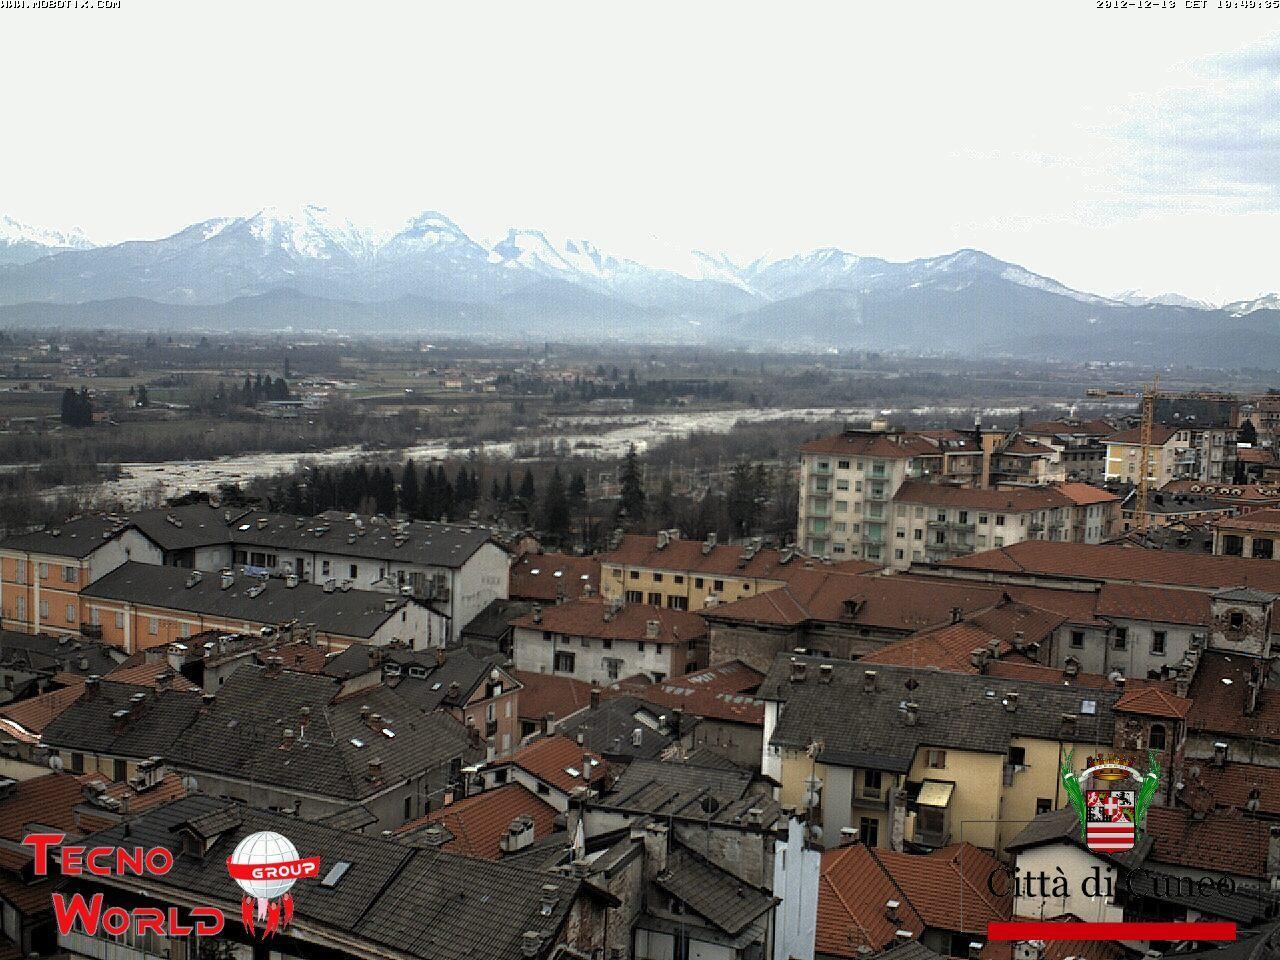 Piemonte, 13 Dicembre 2012: neve in pianura